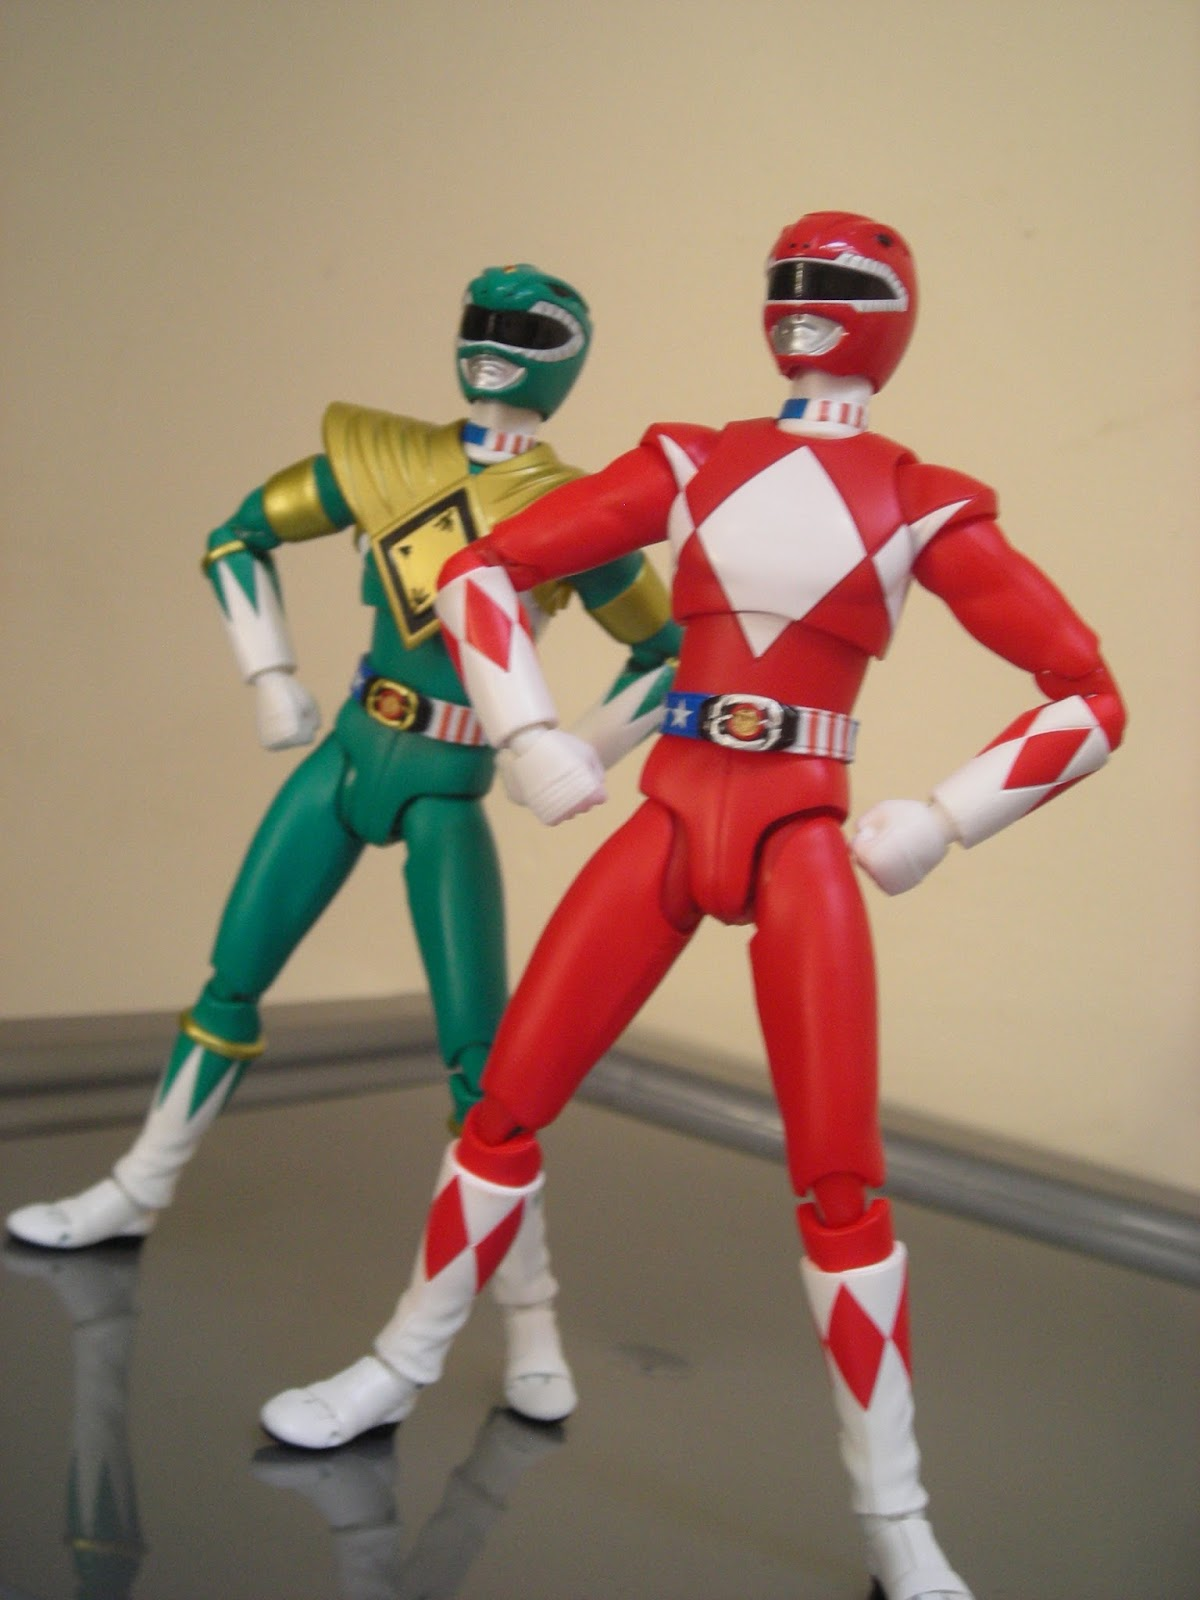 Powerful Rangers SH+Figuarts+Tyranno+Ranger+13